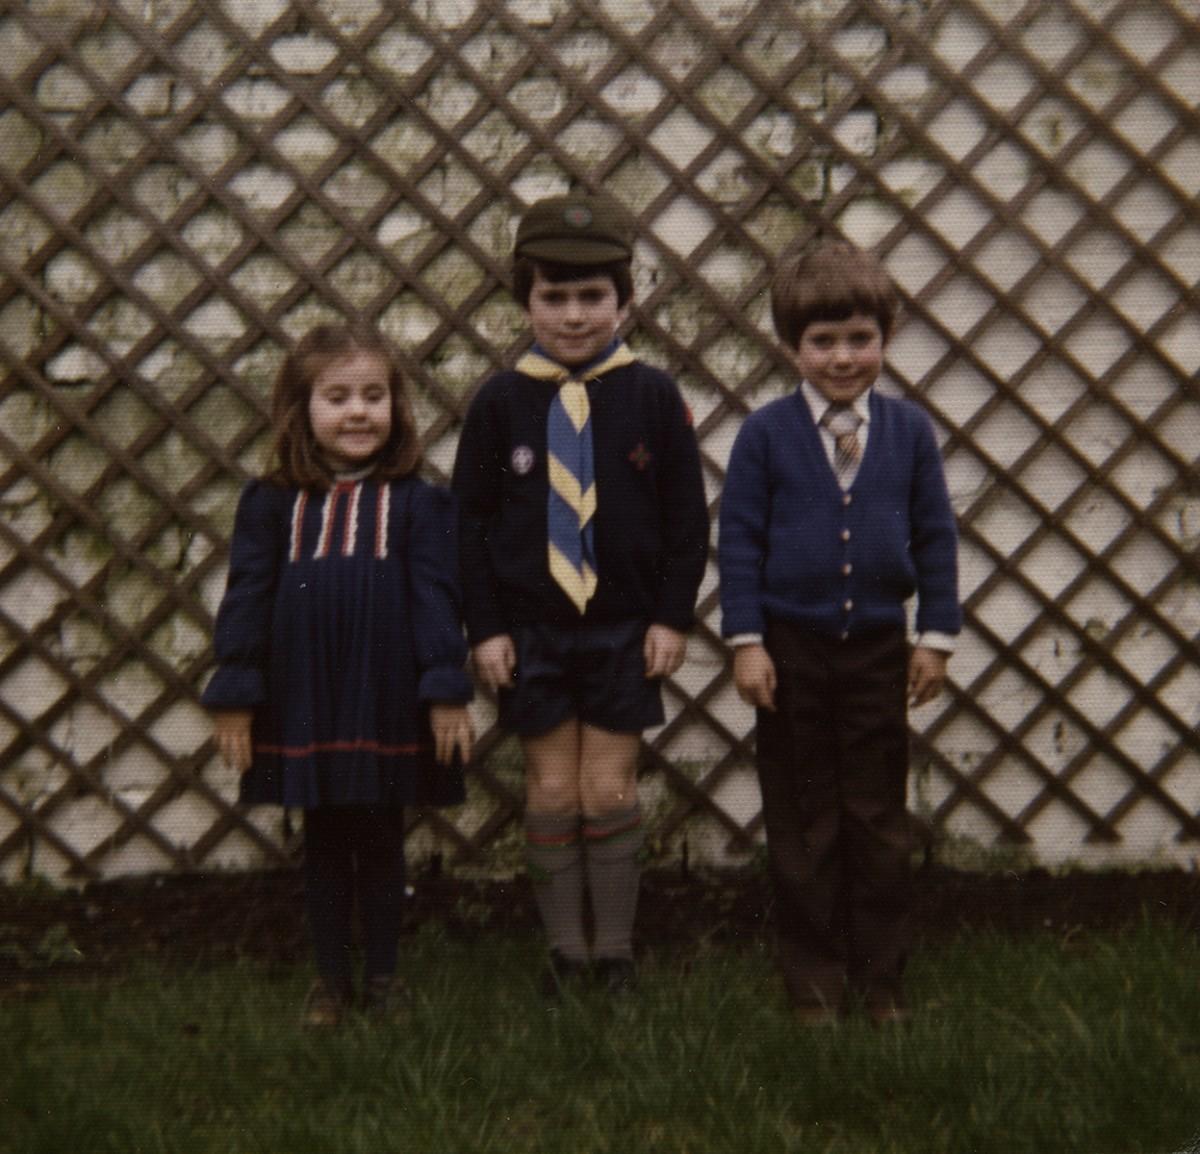 Shanahan // County Dublin :: Children in the Backgarden